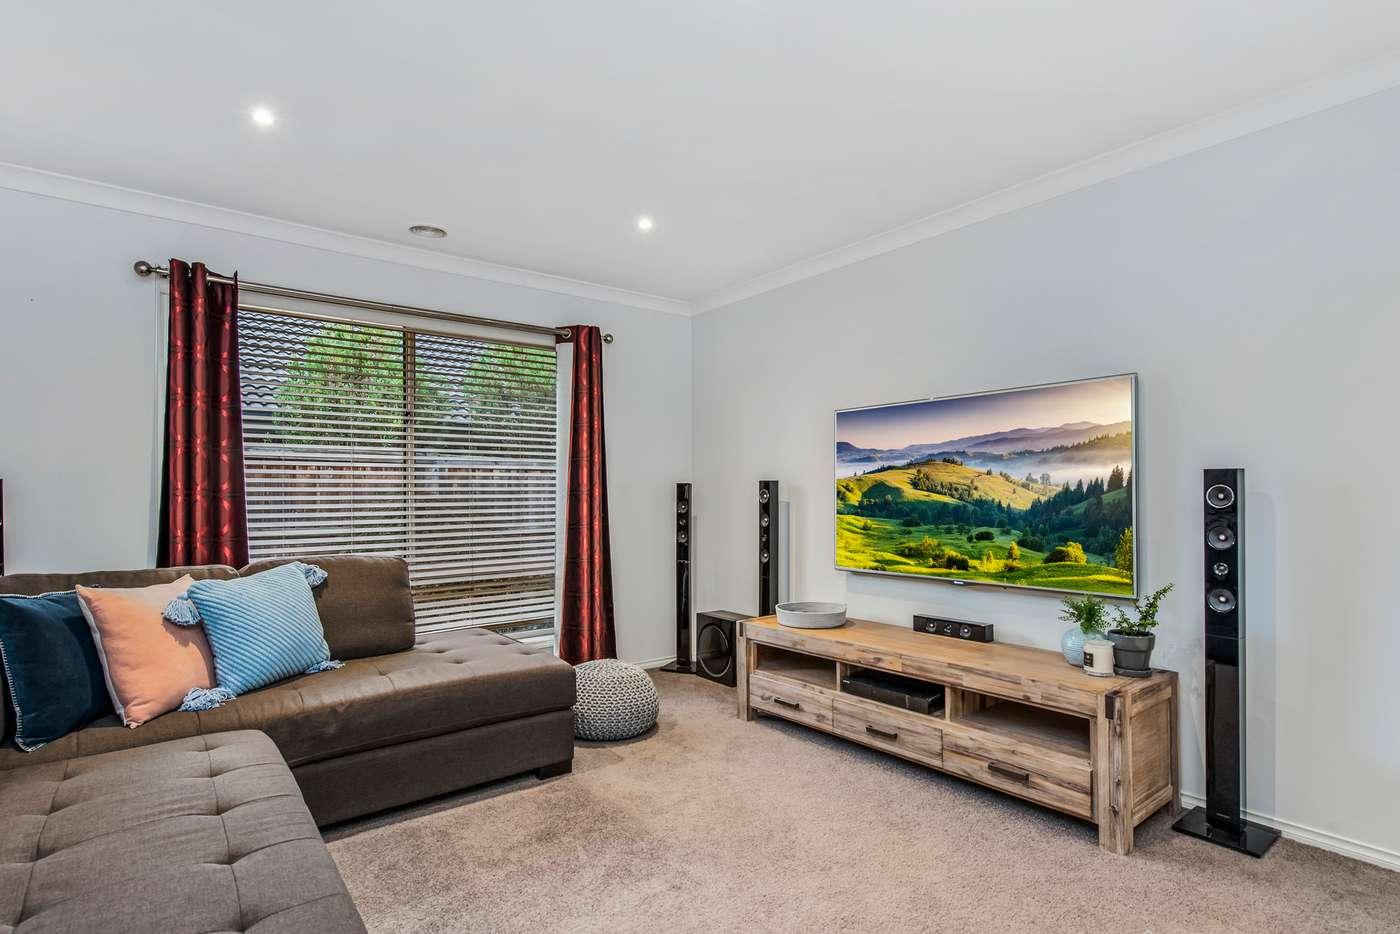 Sixth view of Homely house listing, 8 Eccles Way, Botanic Ridge VIC 3977